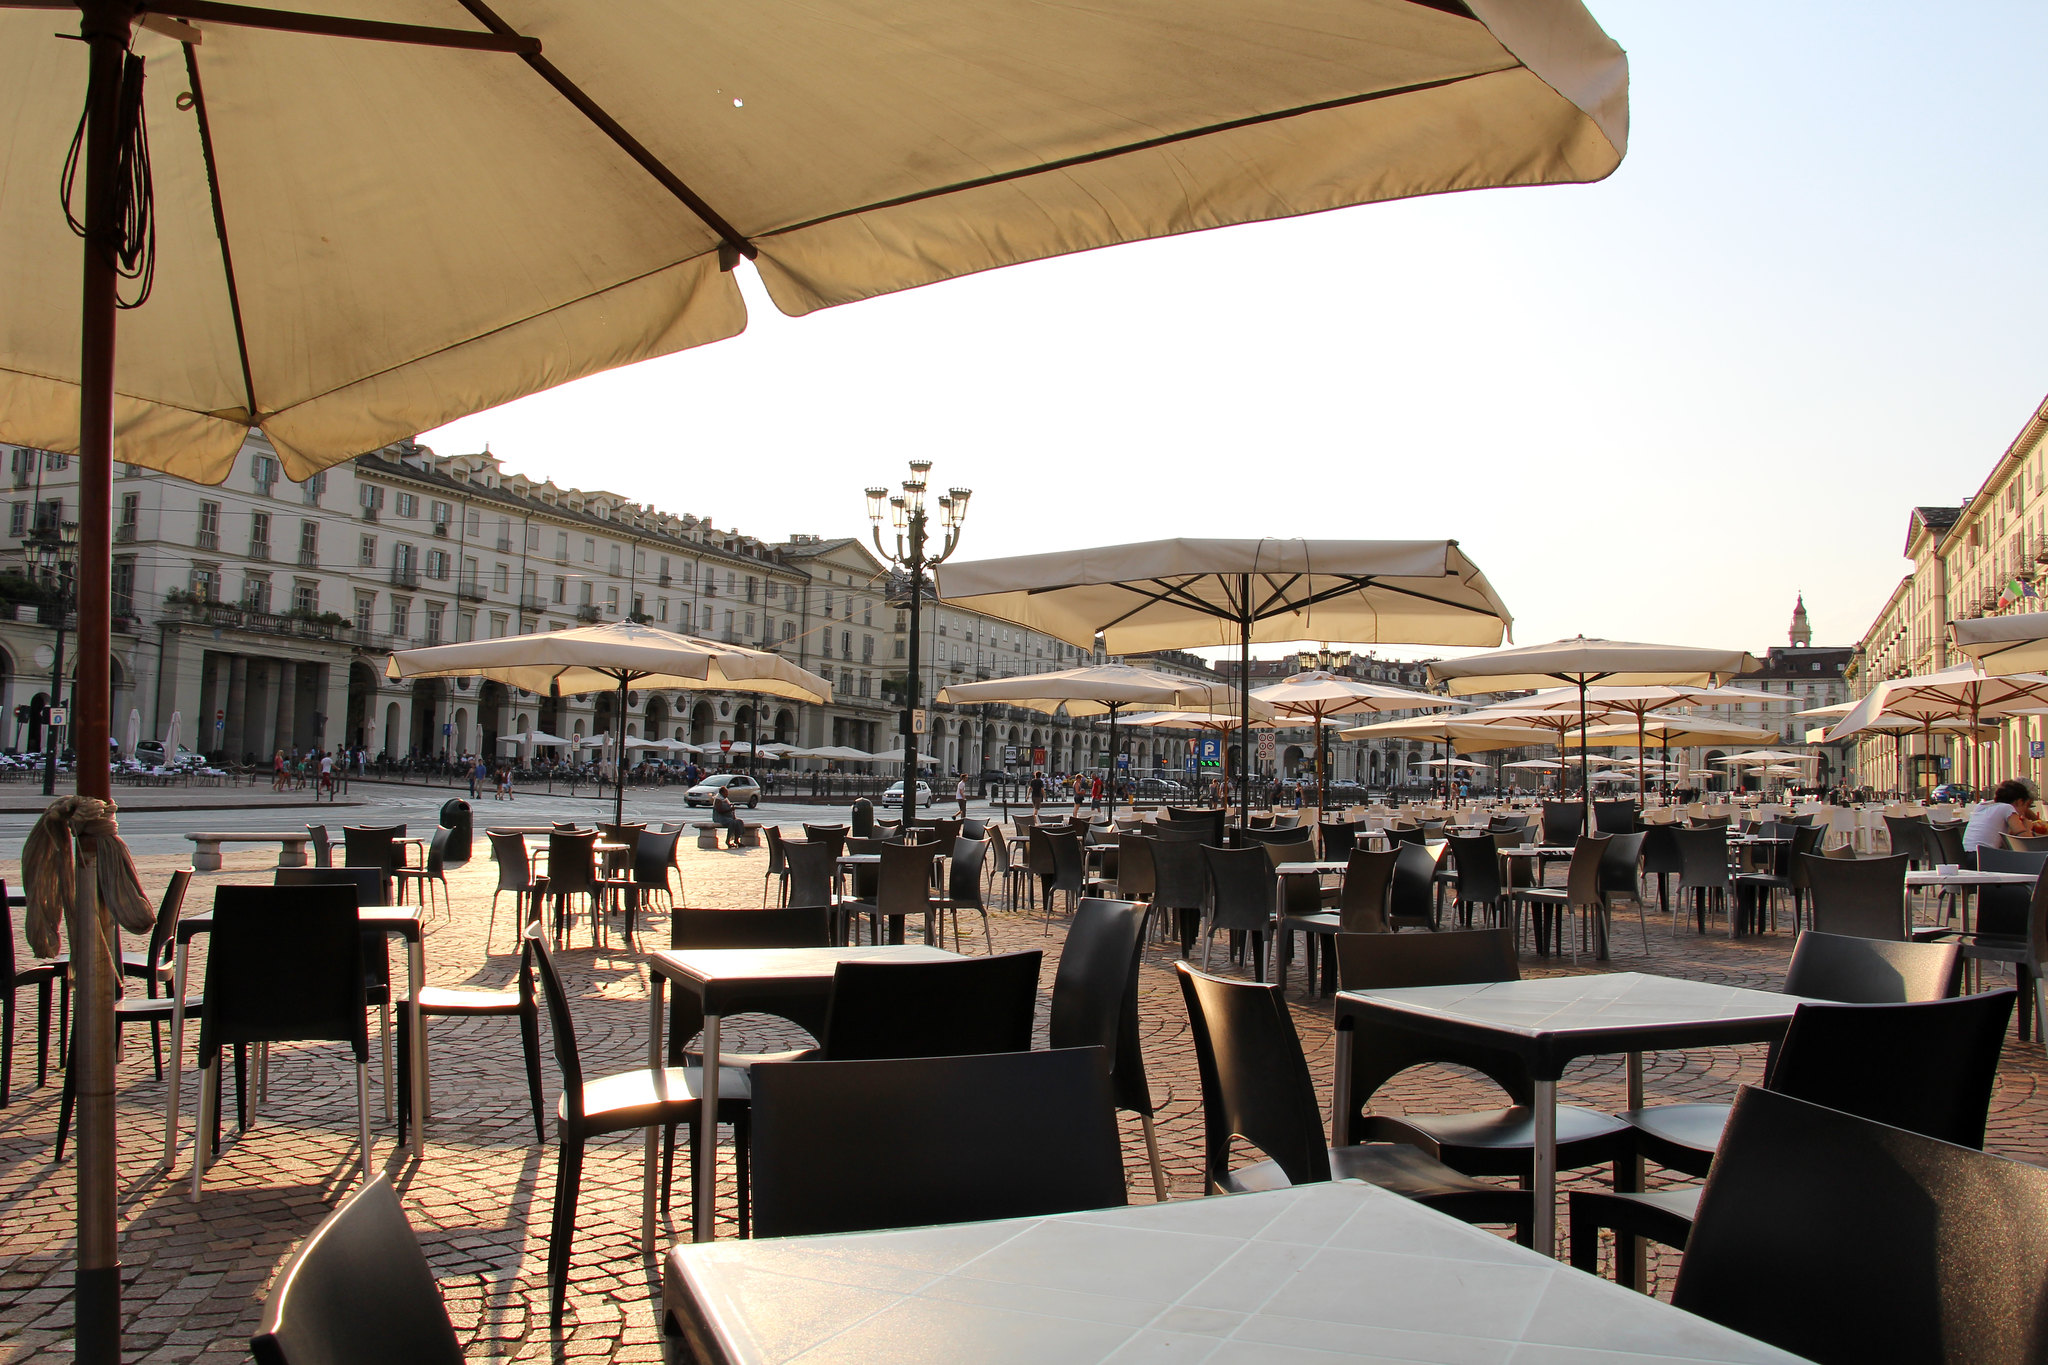 visiter Turin - Piazza Vittorio Veneto